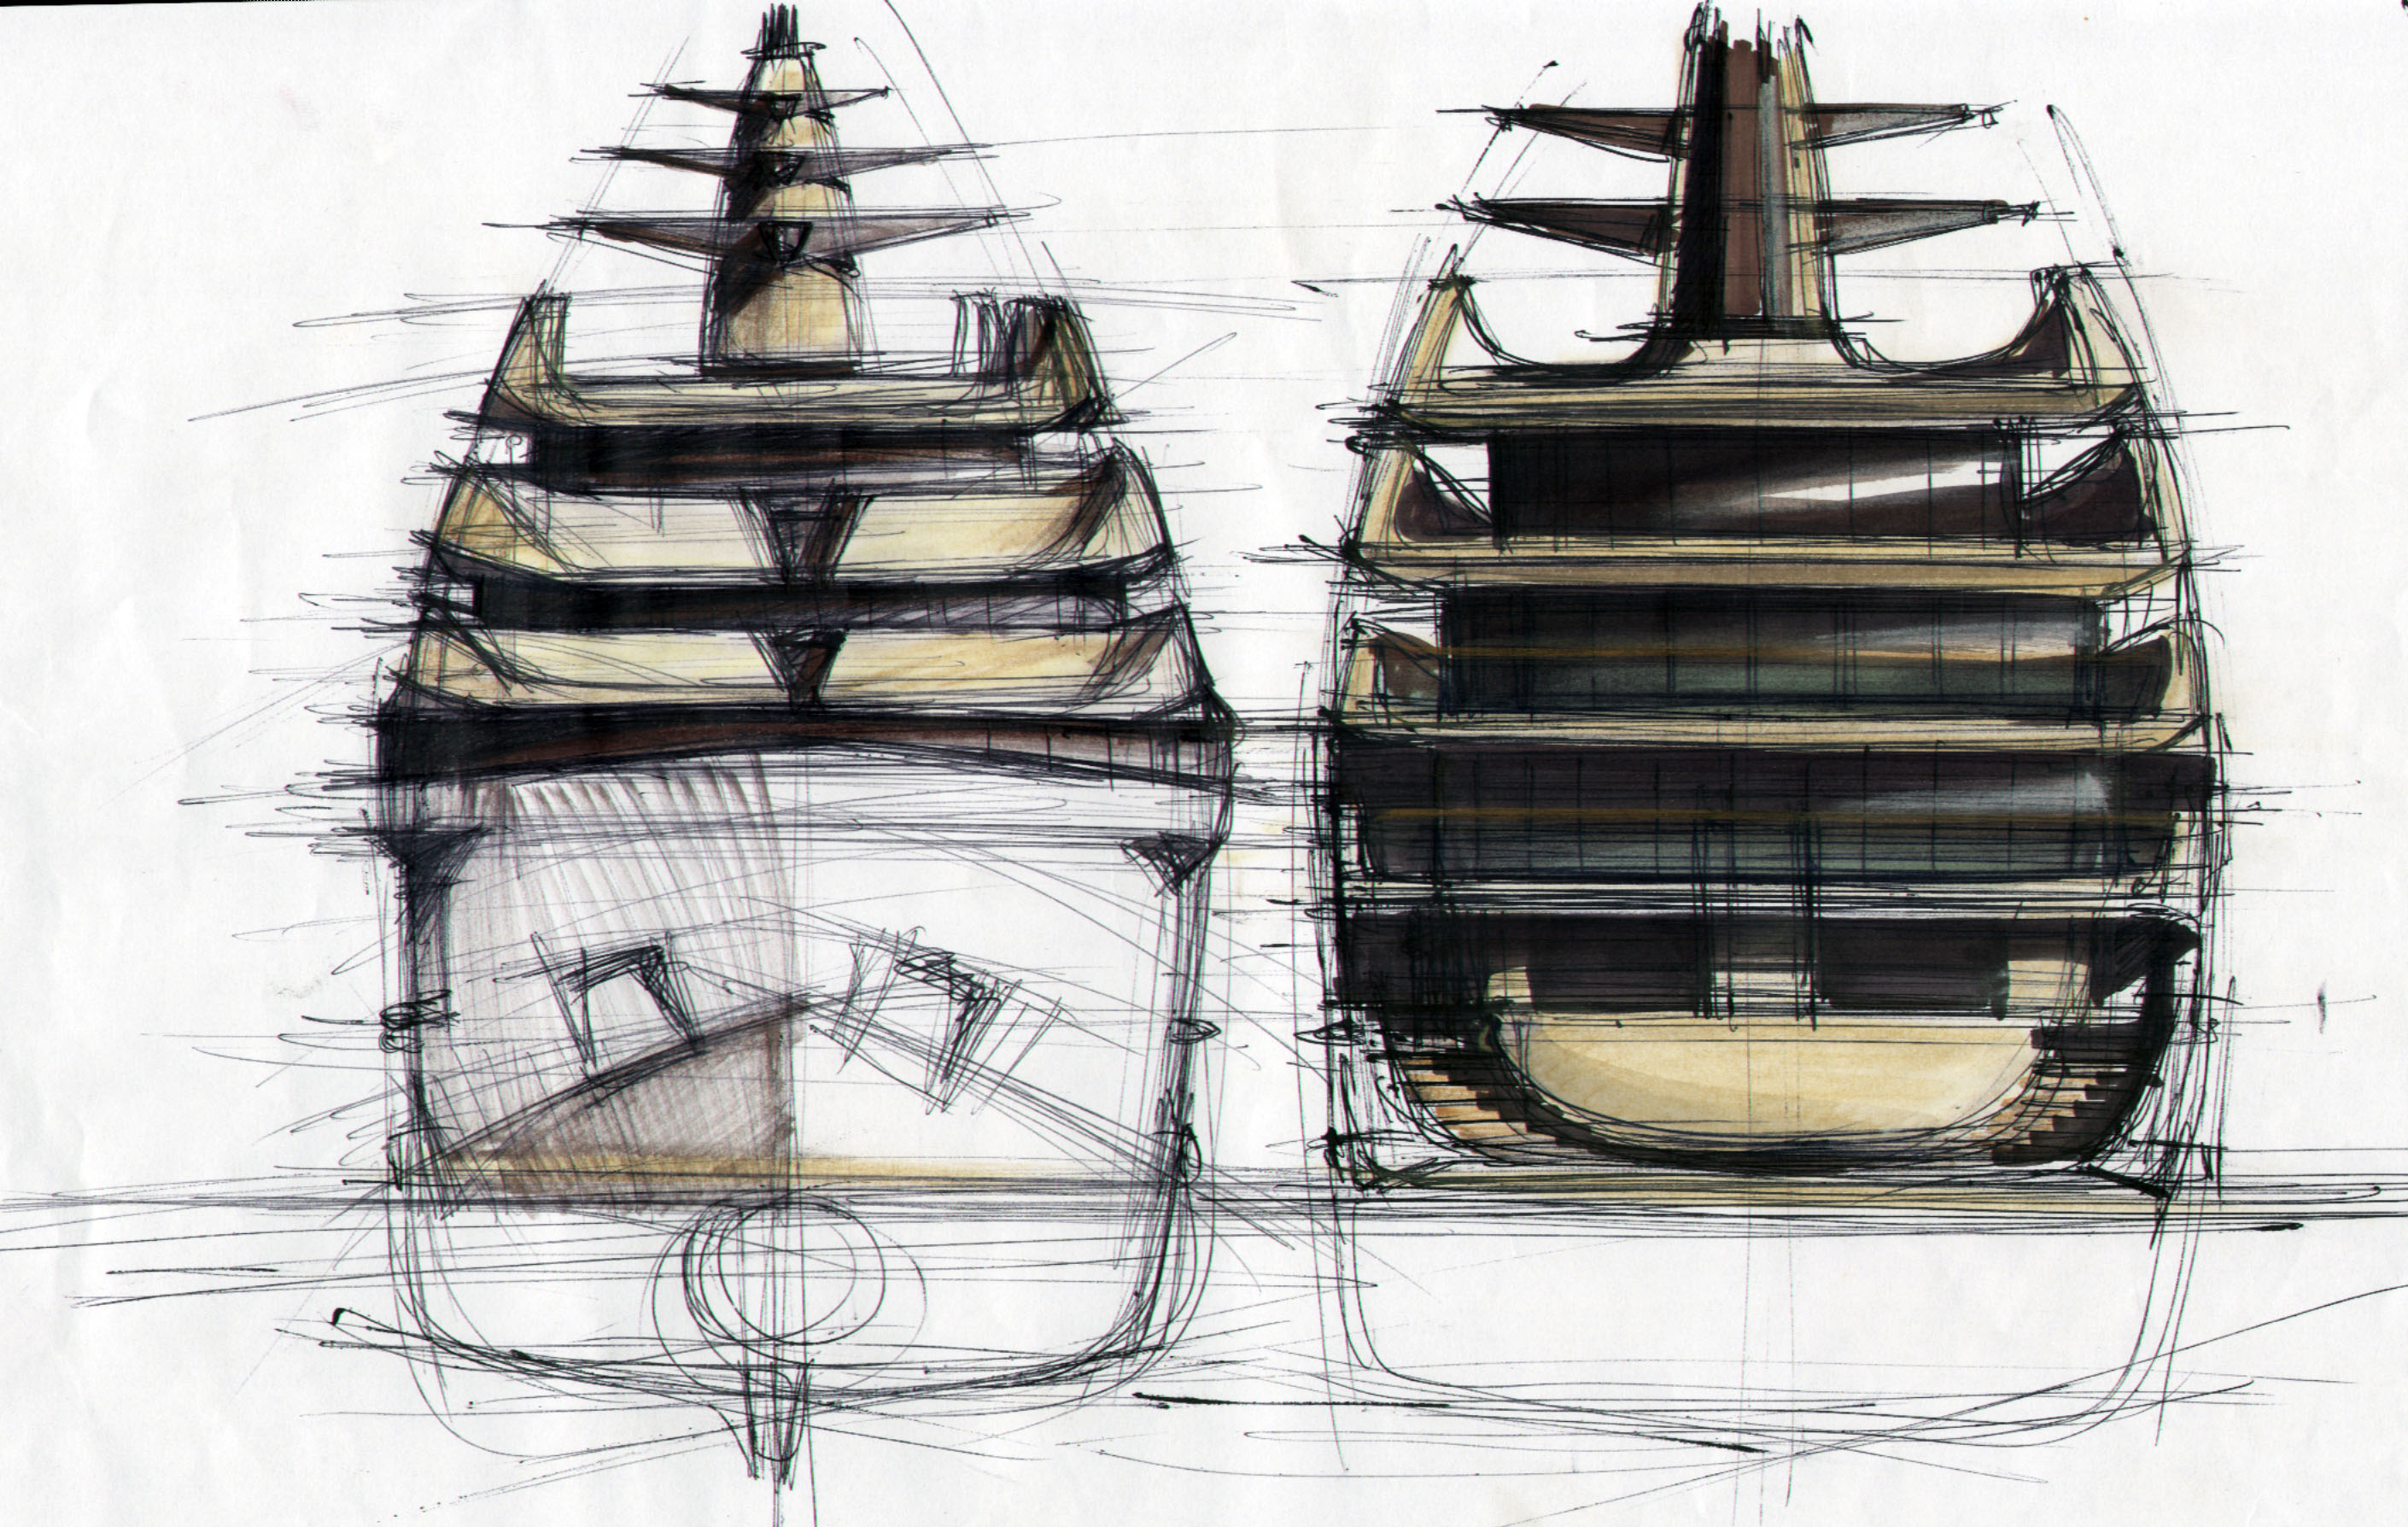 Tankoa superyacht S801 concept - Sketches